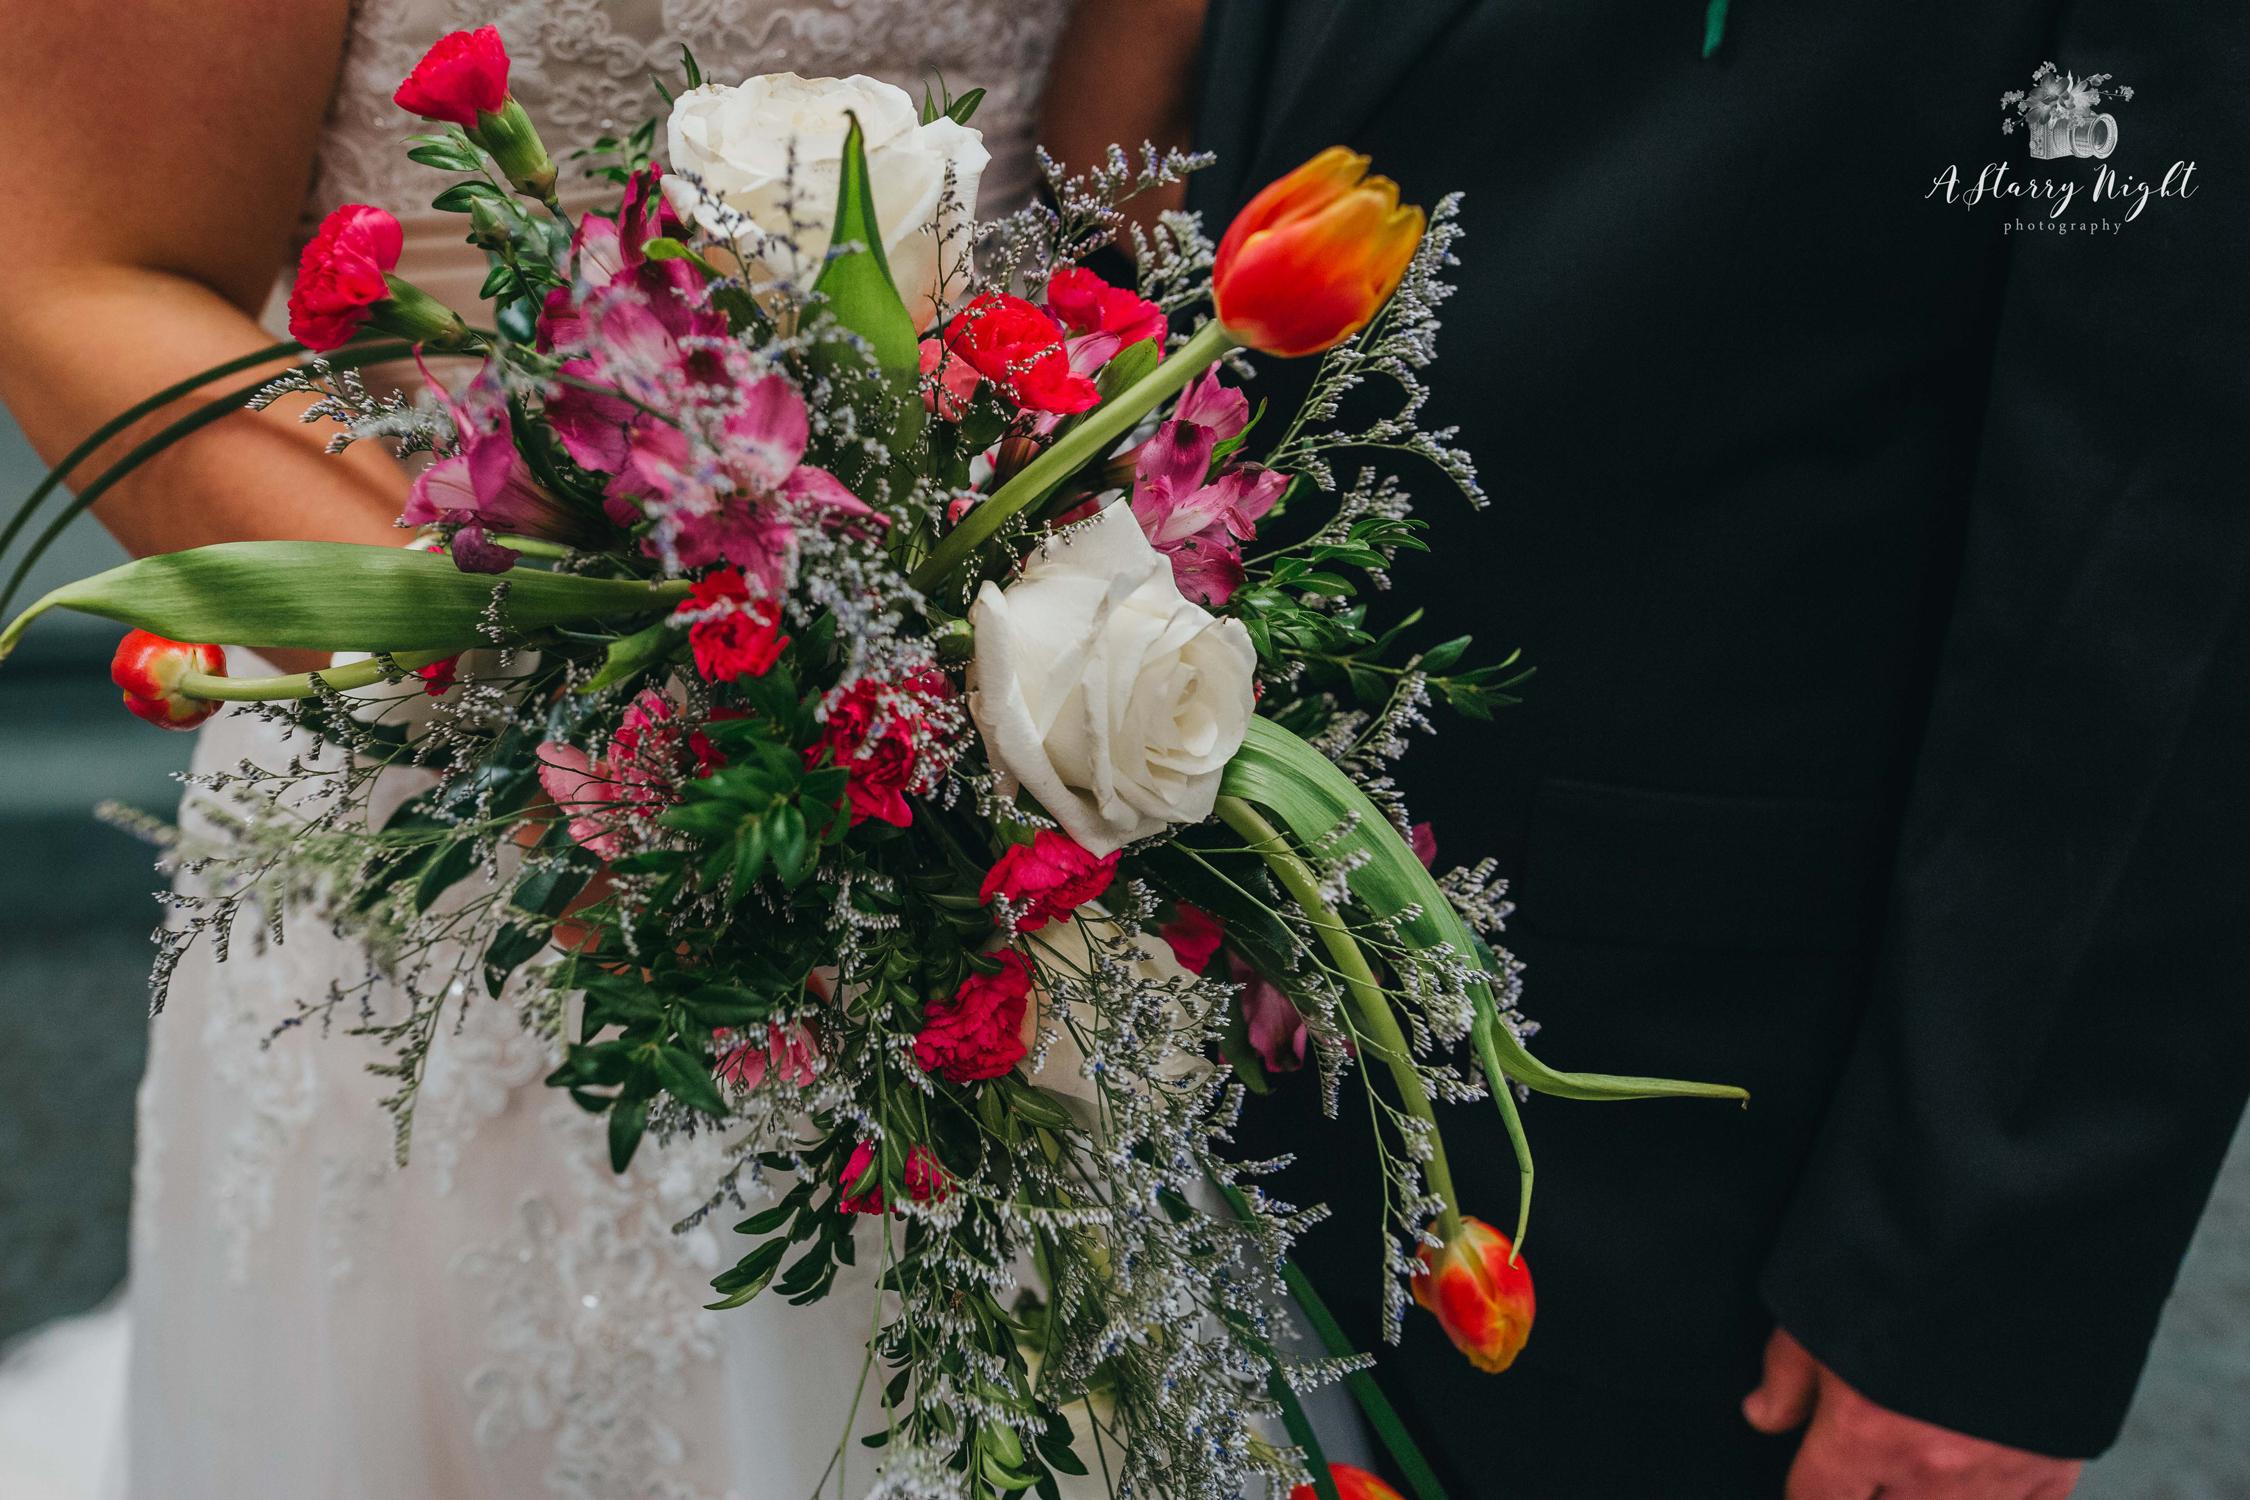 Bride-Groom-Bouquet-Shot-Wedding.jpg